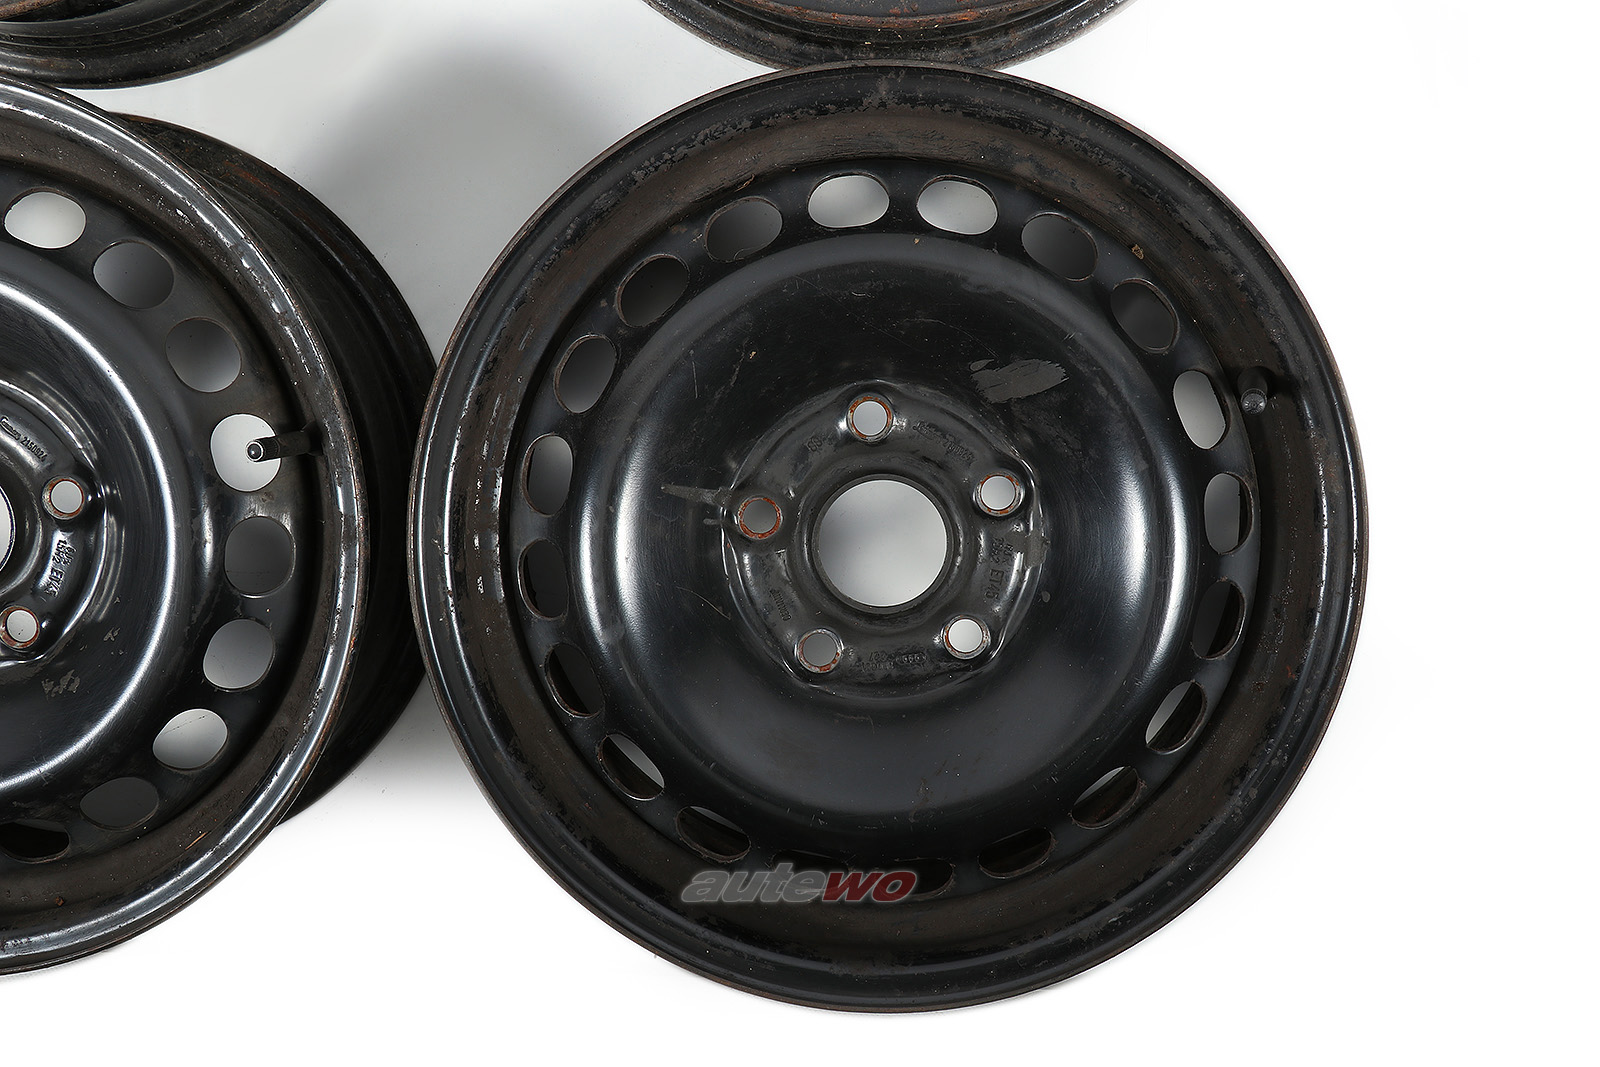 8D0601027 Audi/VW A4 B5/100/A6 C4/4B/Passat 3B Stahlfelgensatz 6Jx15 ET45 5x112